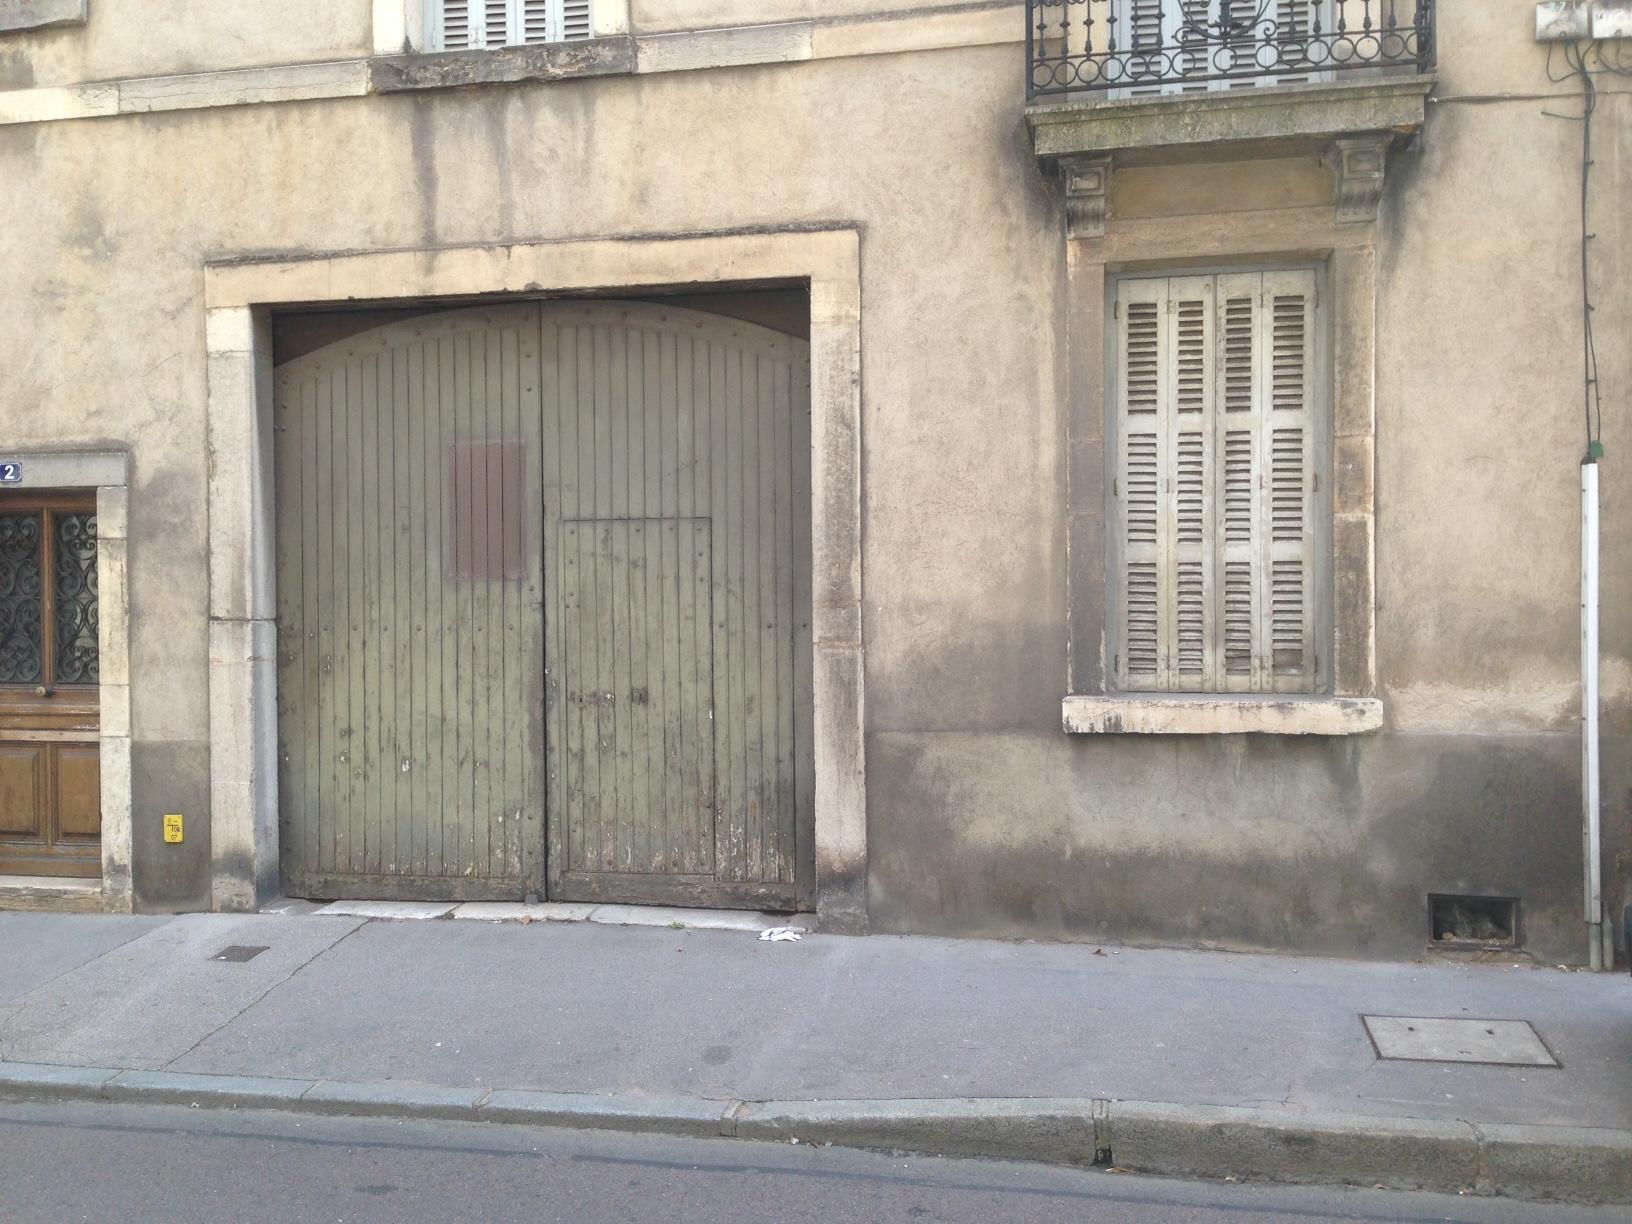 appartement atelier loft rue berliet vendu fdpi. Black Bedroom Furniture Sets. Home Design Ideas